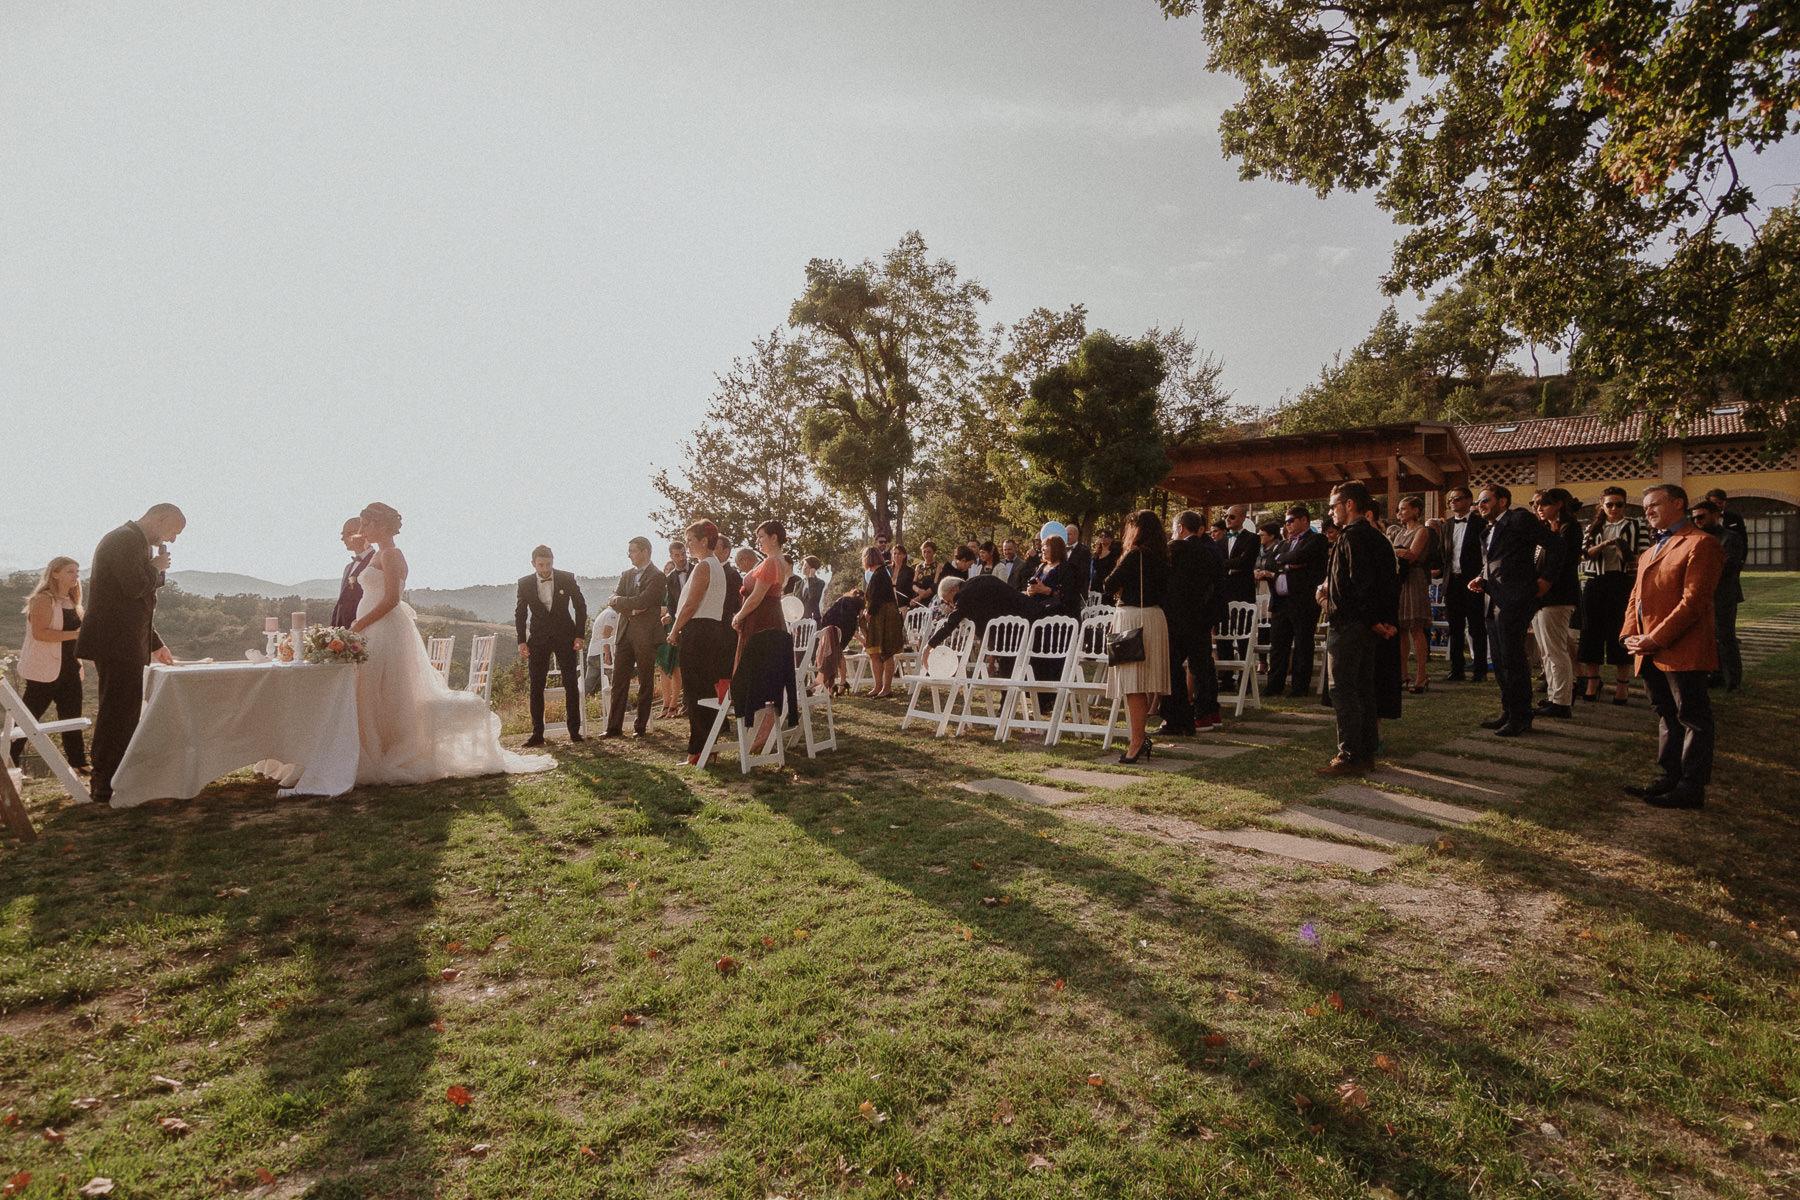 fotografo-matrimonio-monte-gesso-cerimonia-civile-sposa-francesco-ferrarini